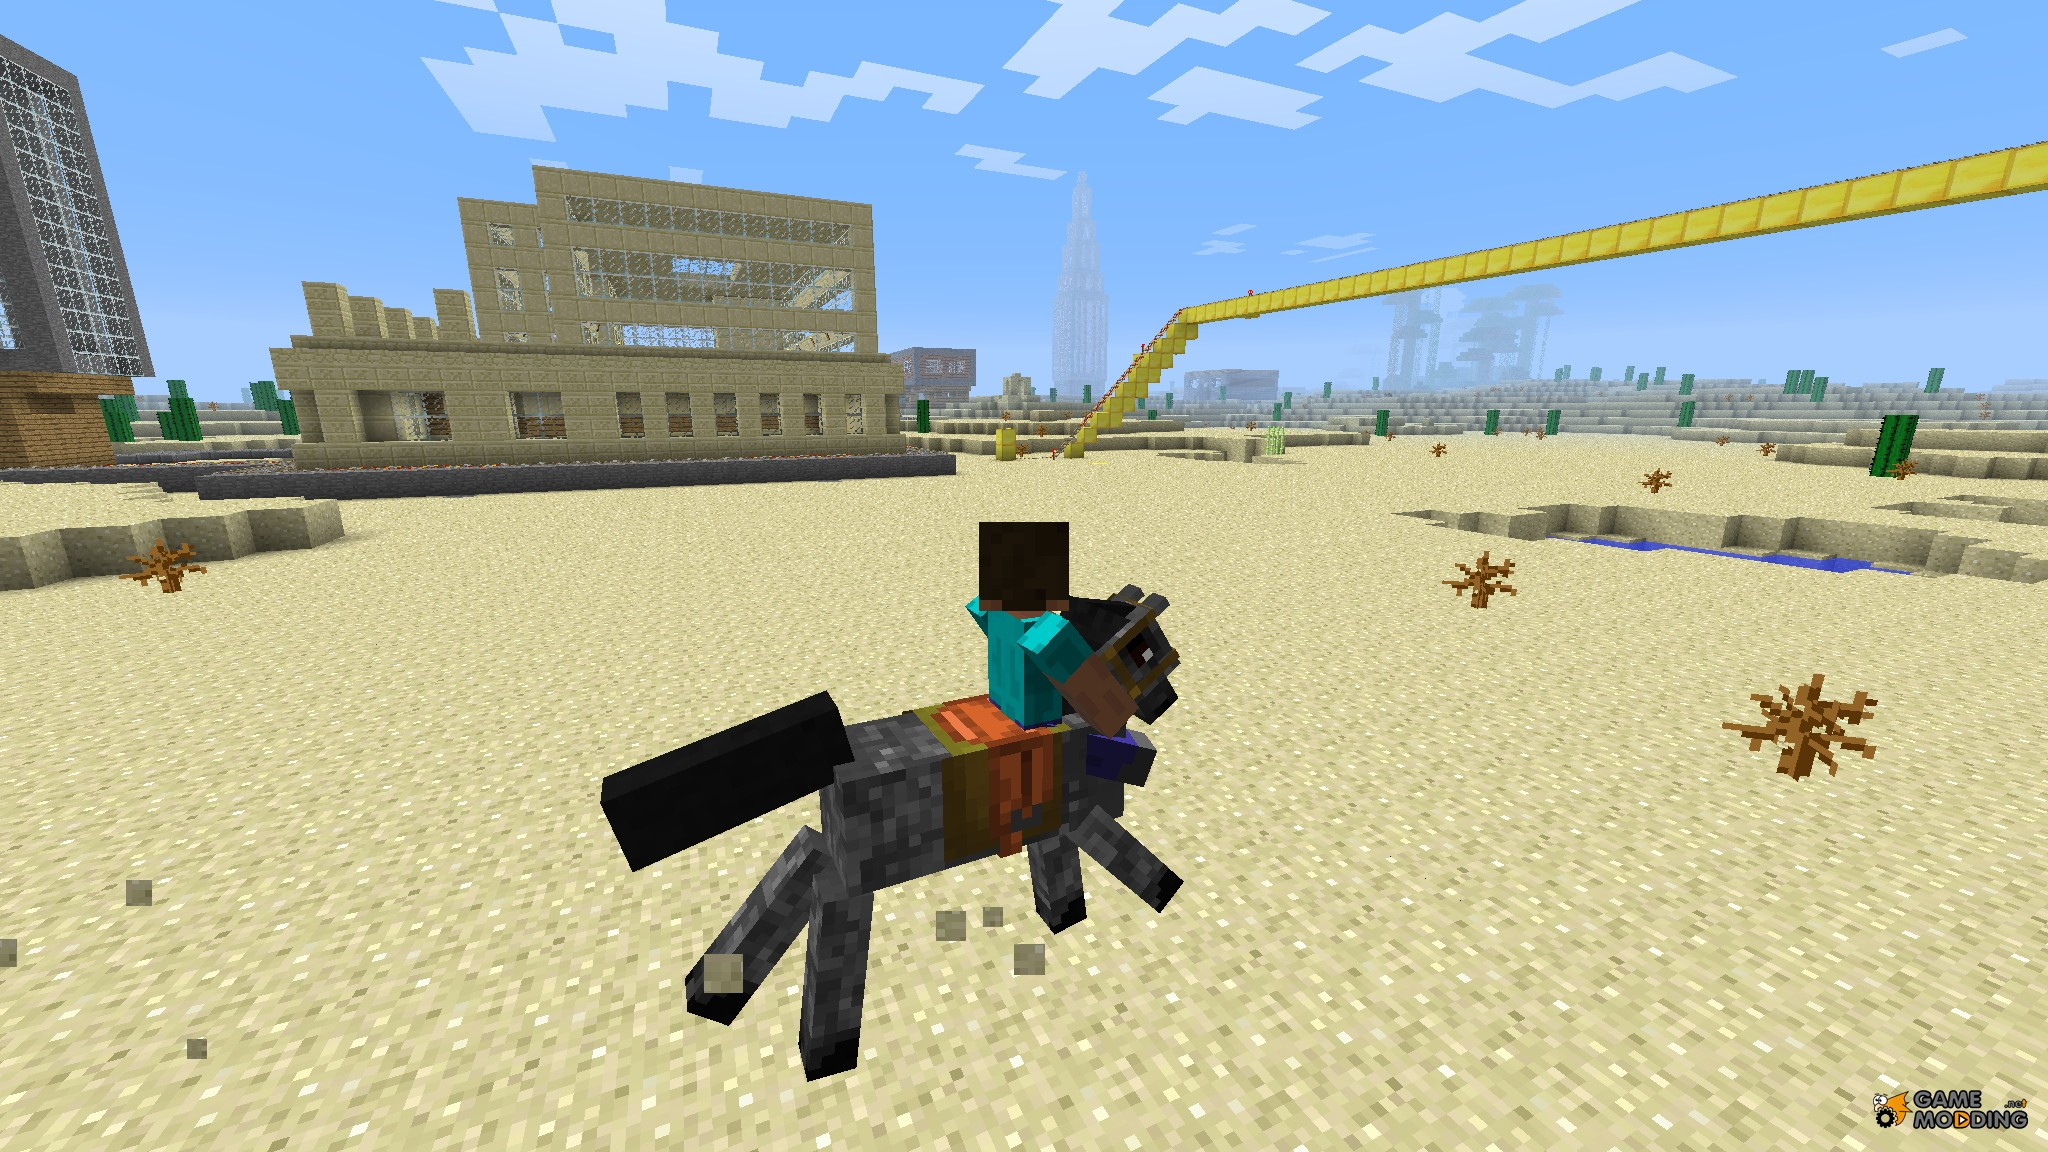 1423172232 2015 02 05 183511 Lb Photo Realism HD Minecraft 2048x1152